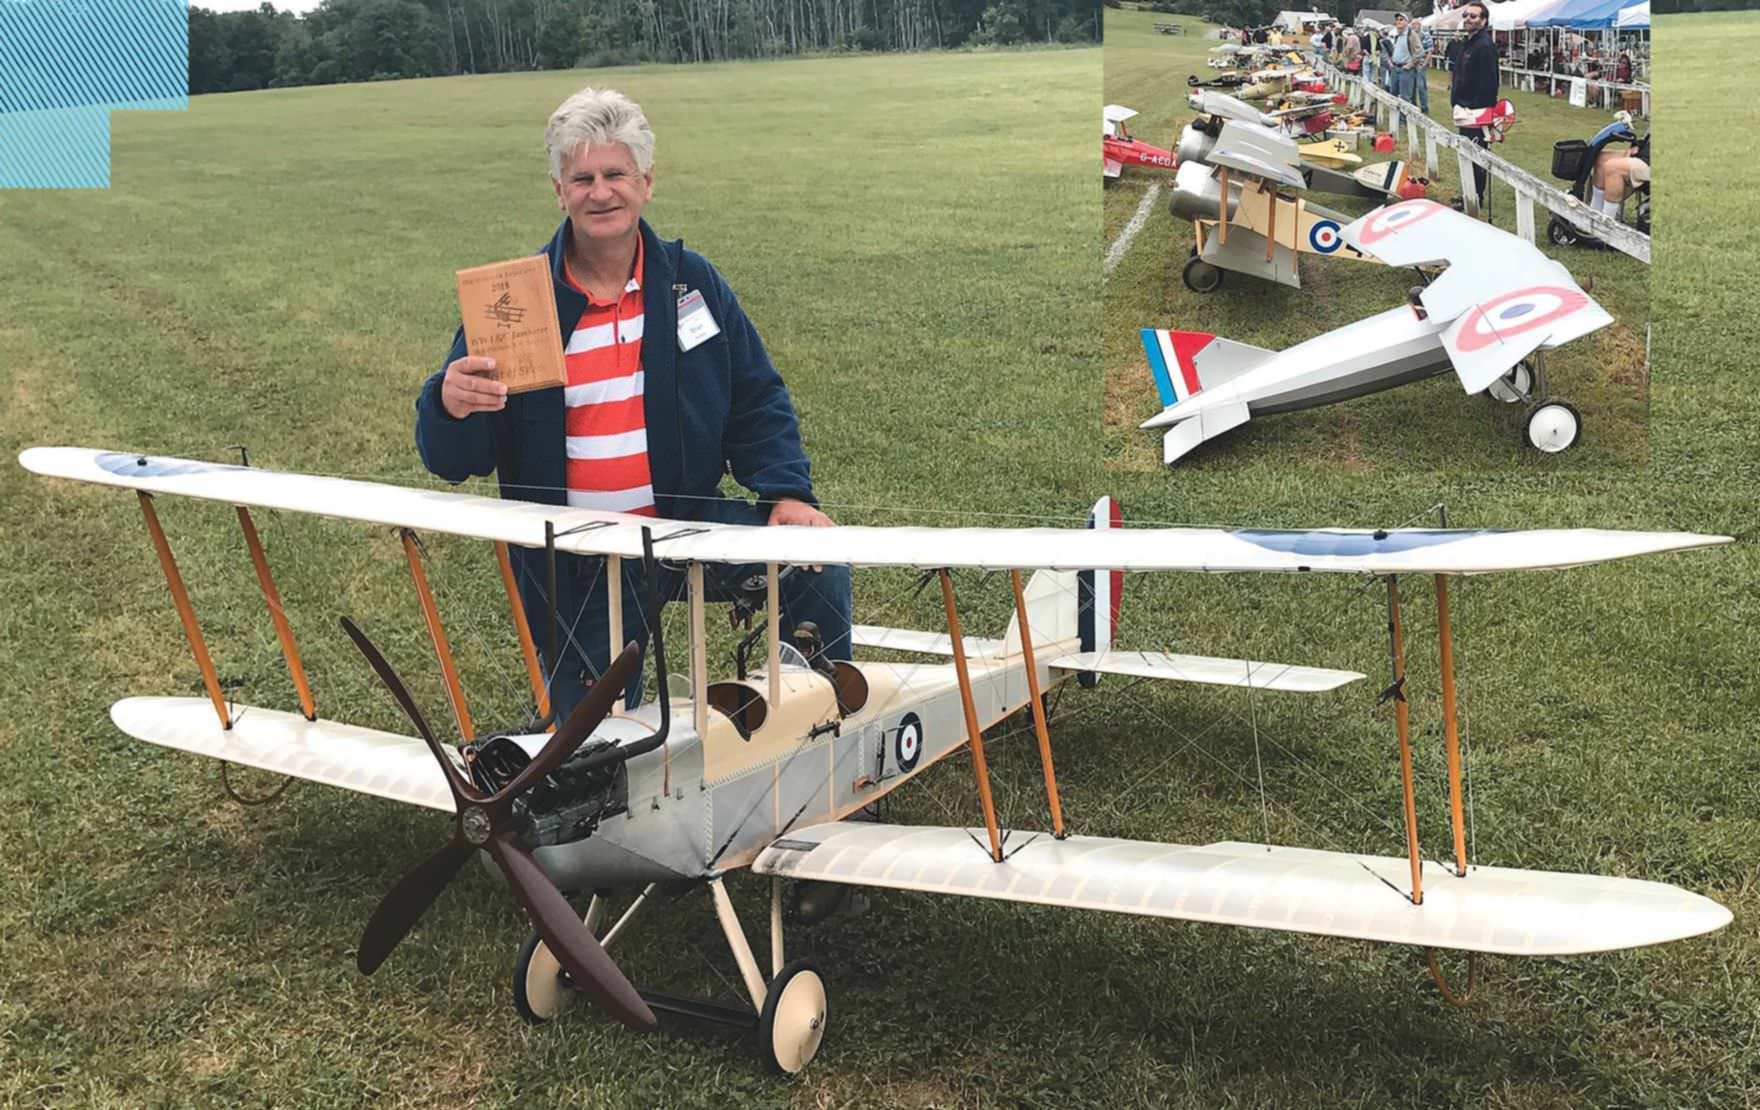 Winners At The Old Rhinebeck Aerodrome Jamboree